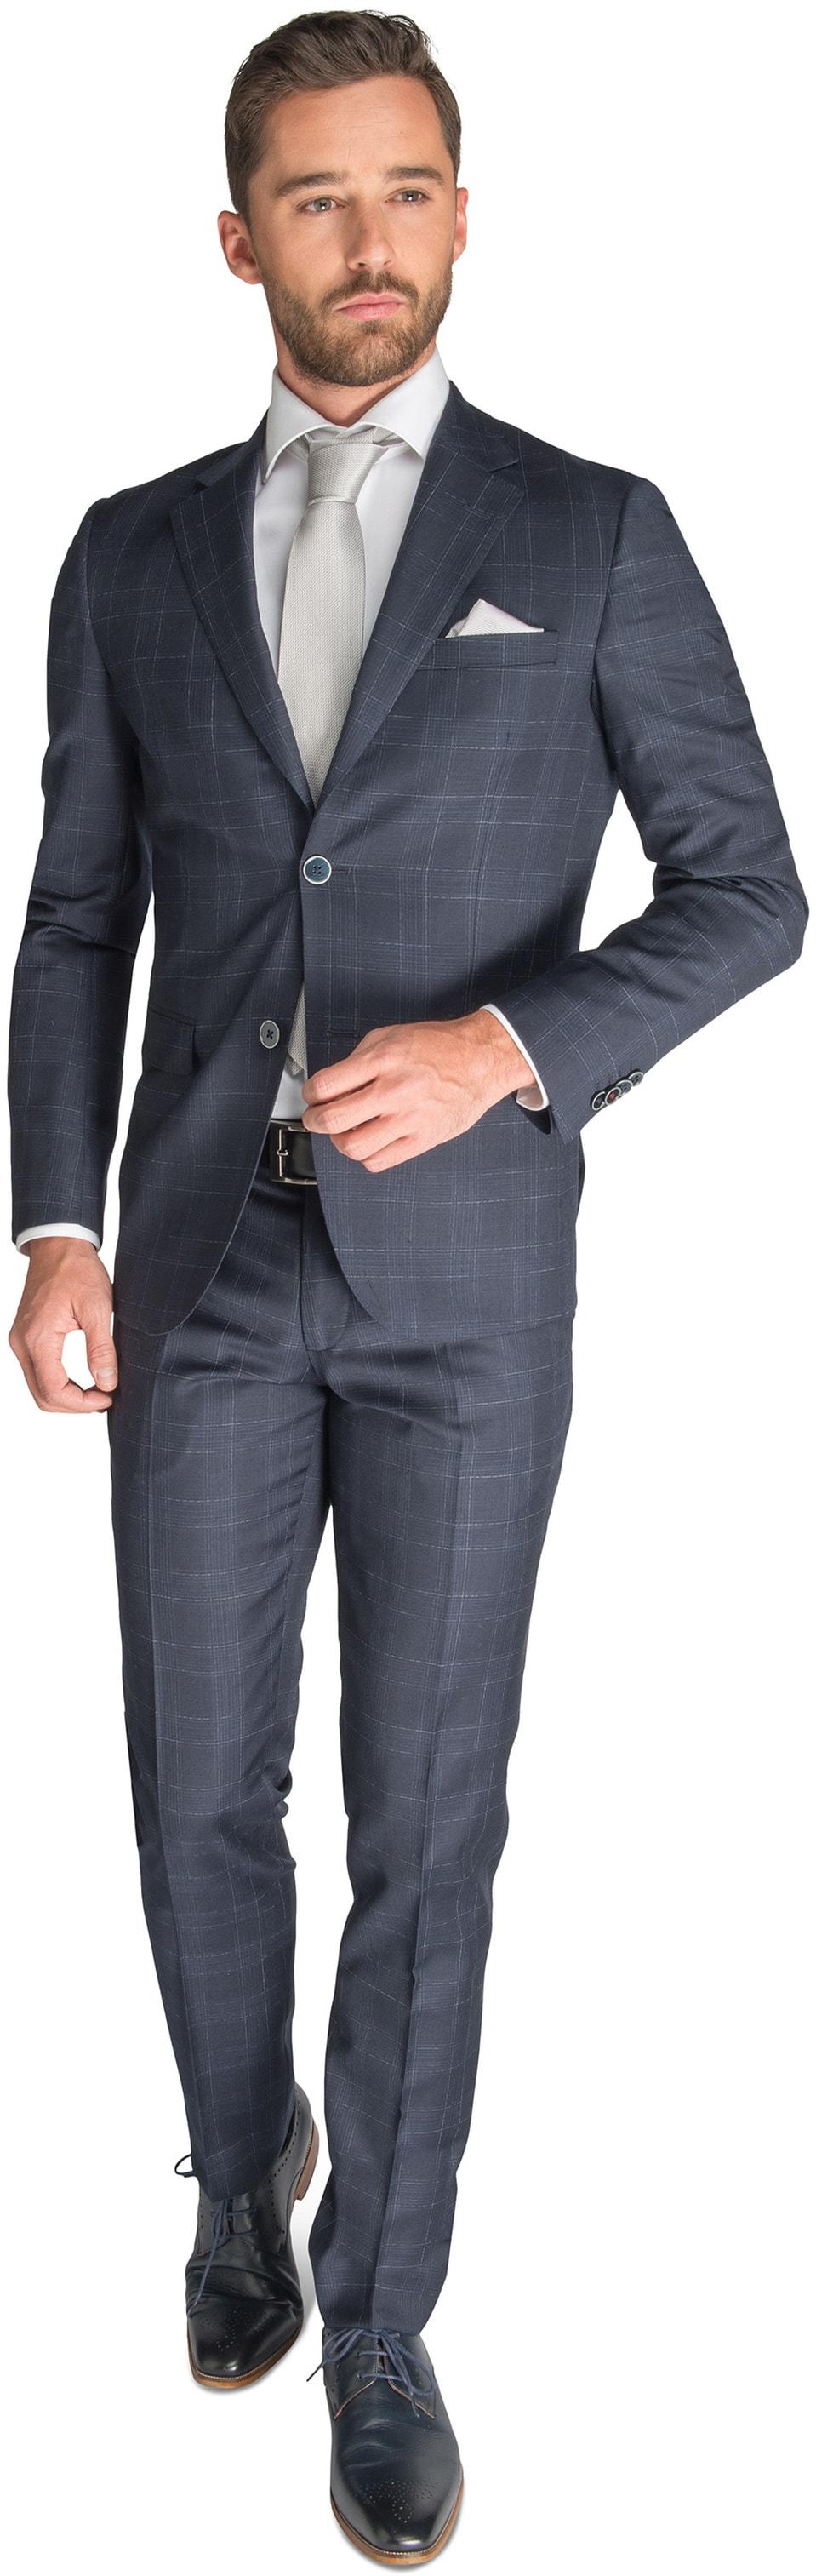 Suitable Suit Zurich Dark Blue foto 0